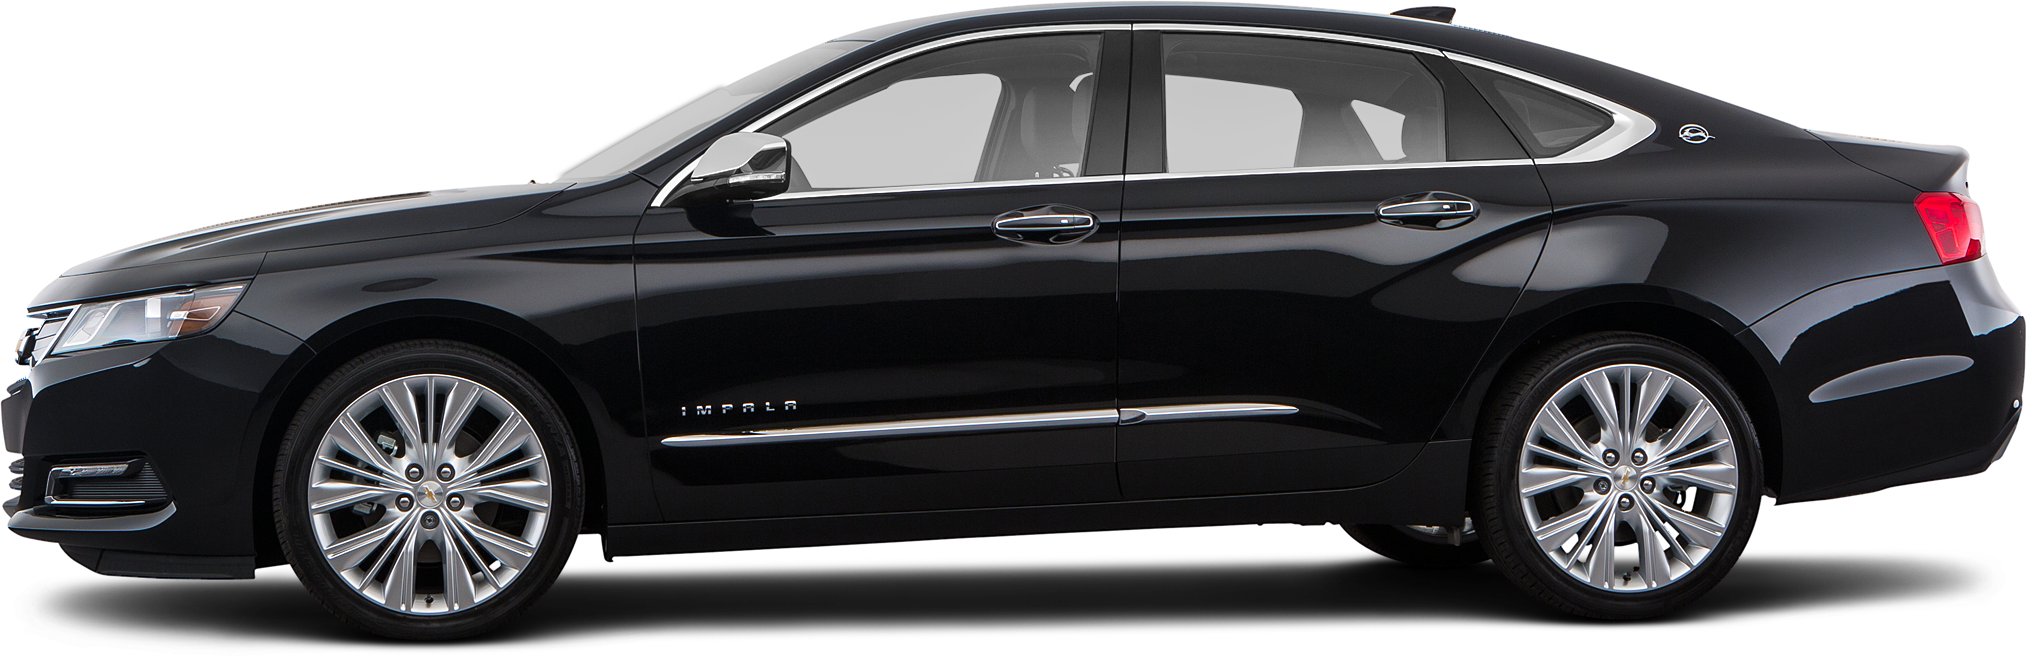 2020 Chevrolet Impala Sedan Premier